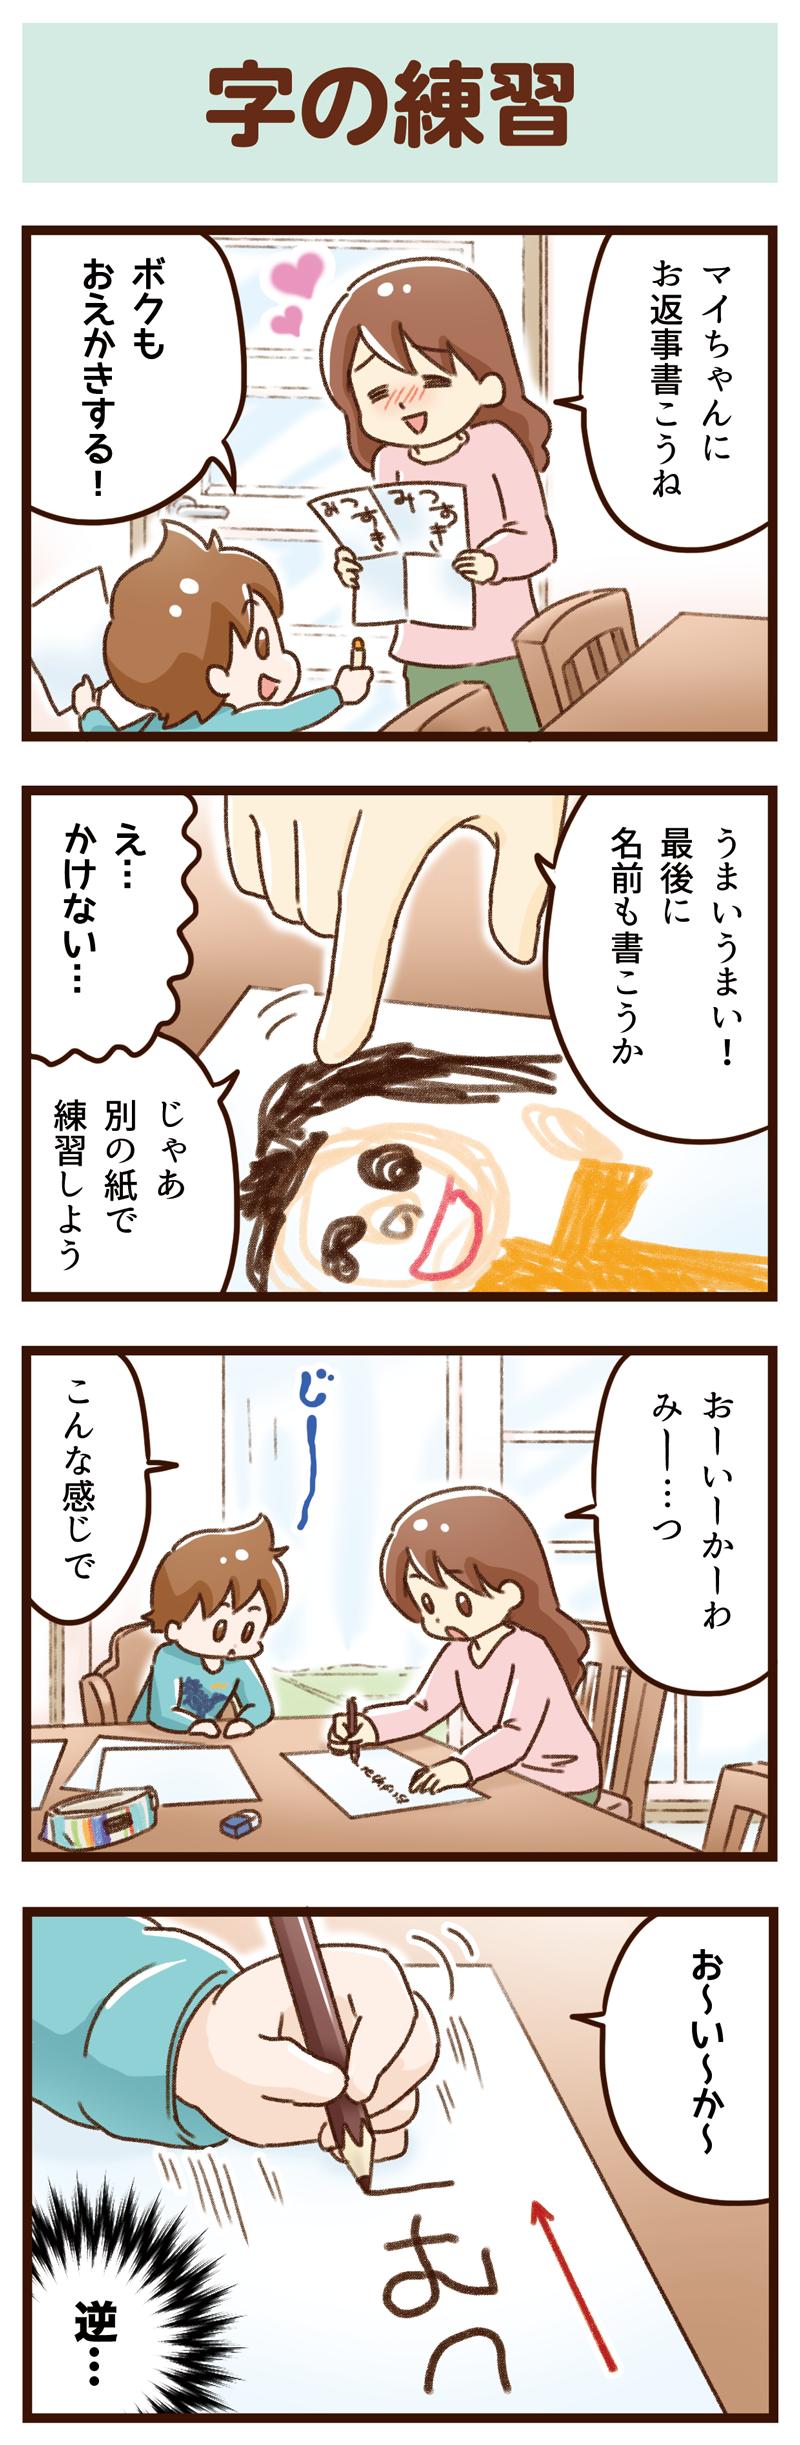 yumui245-1